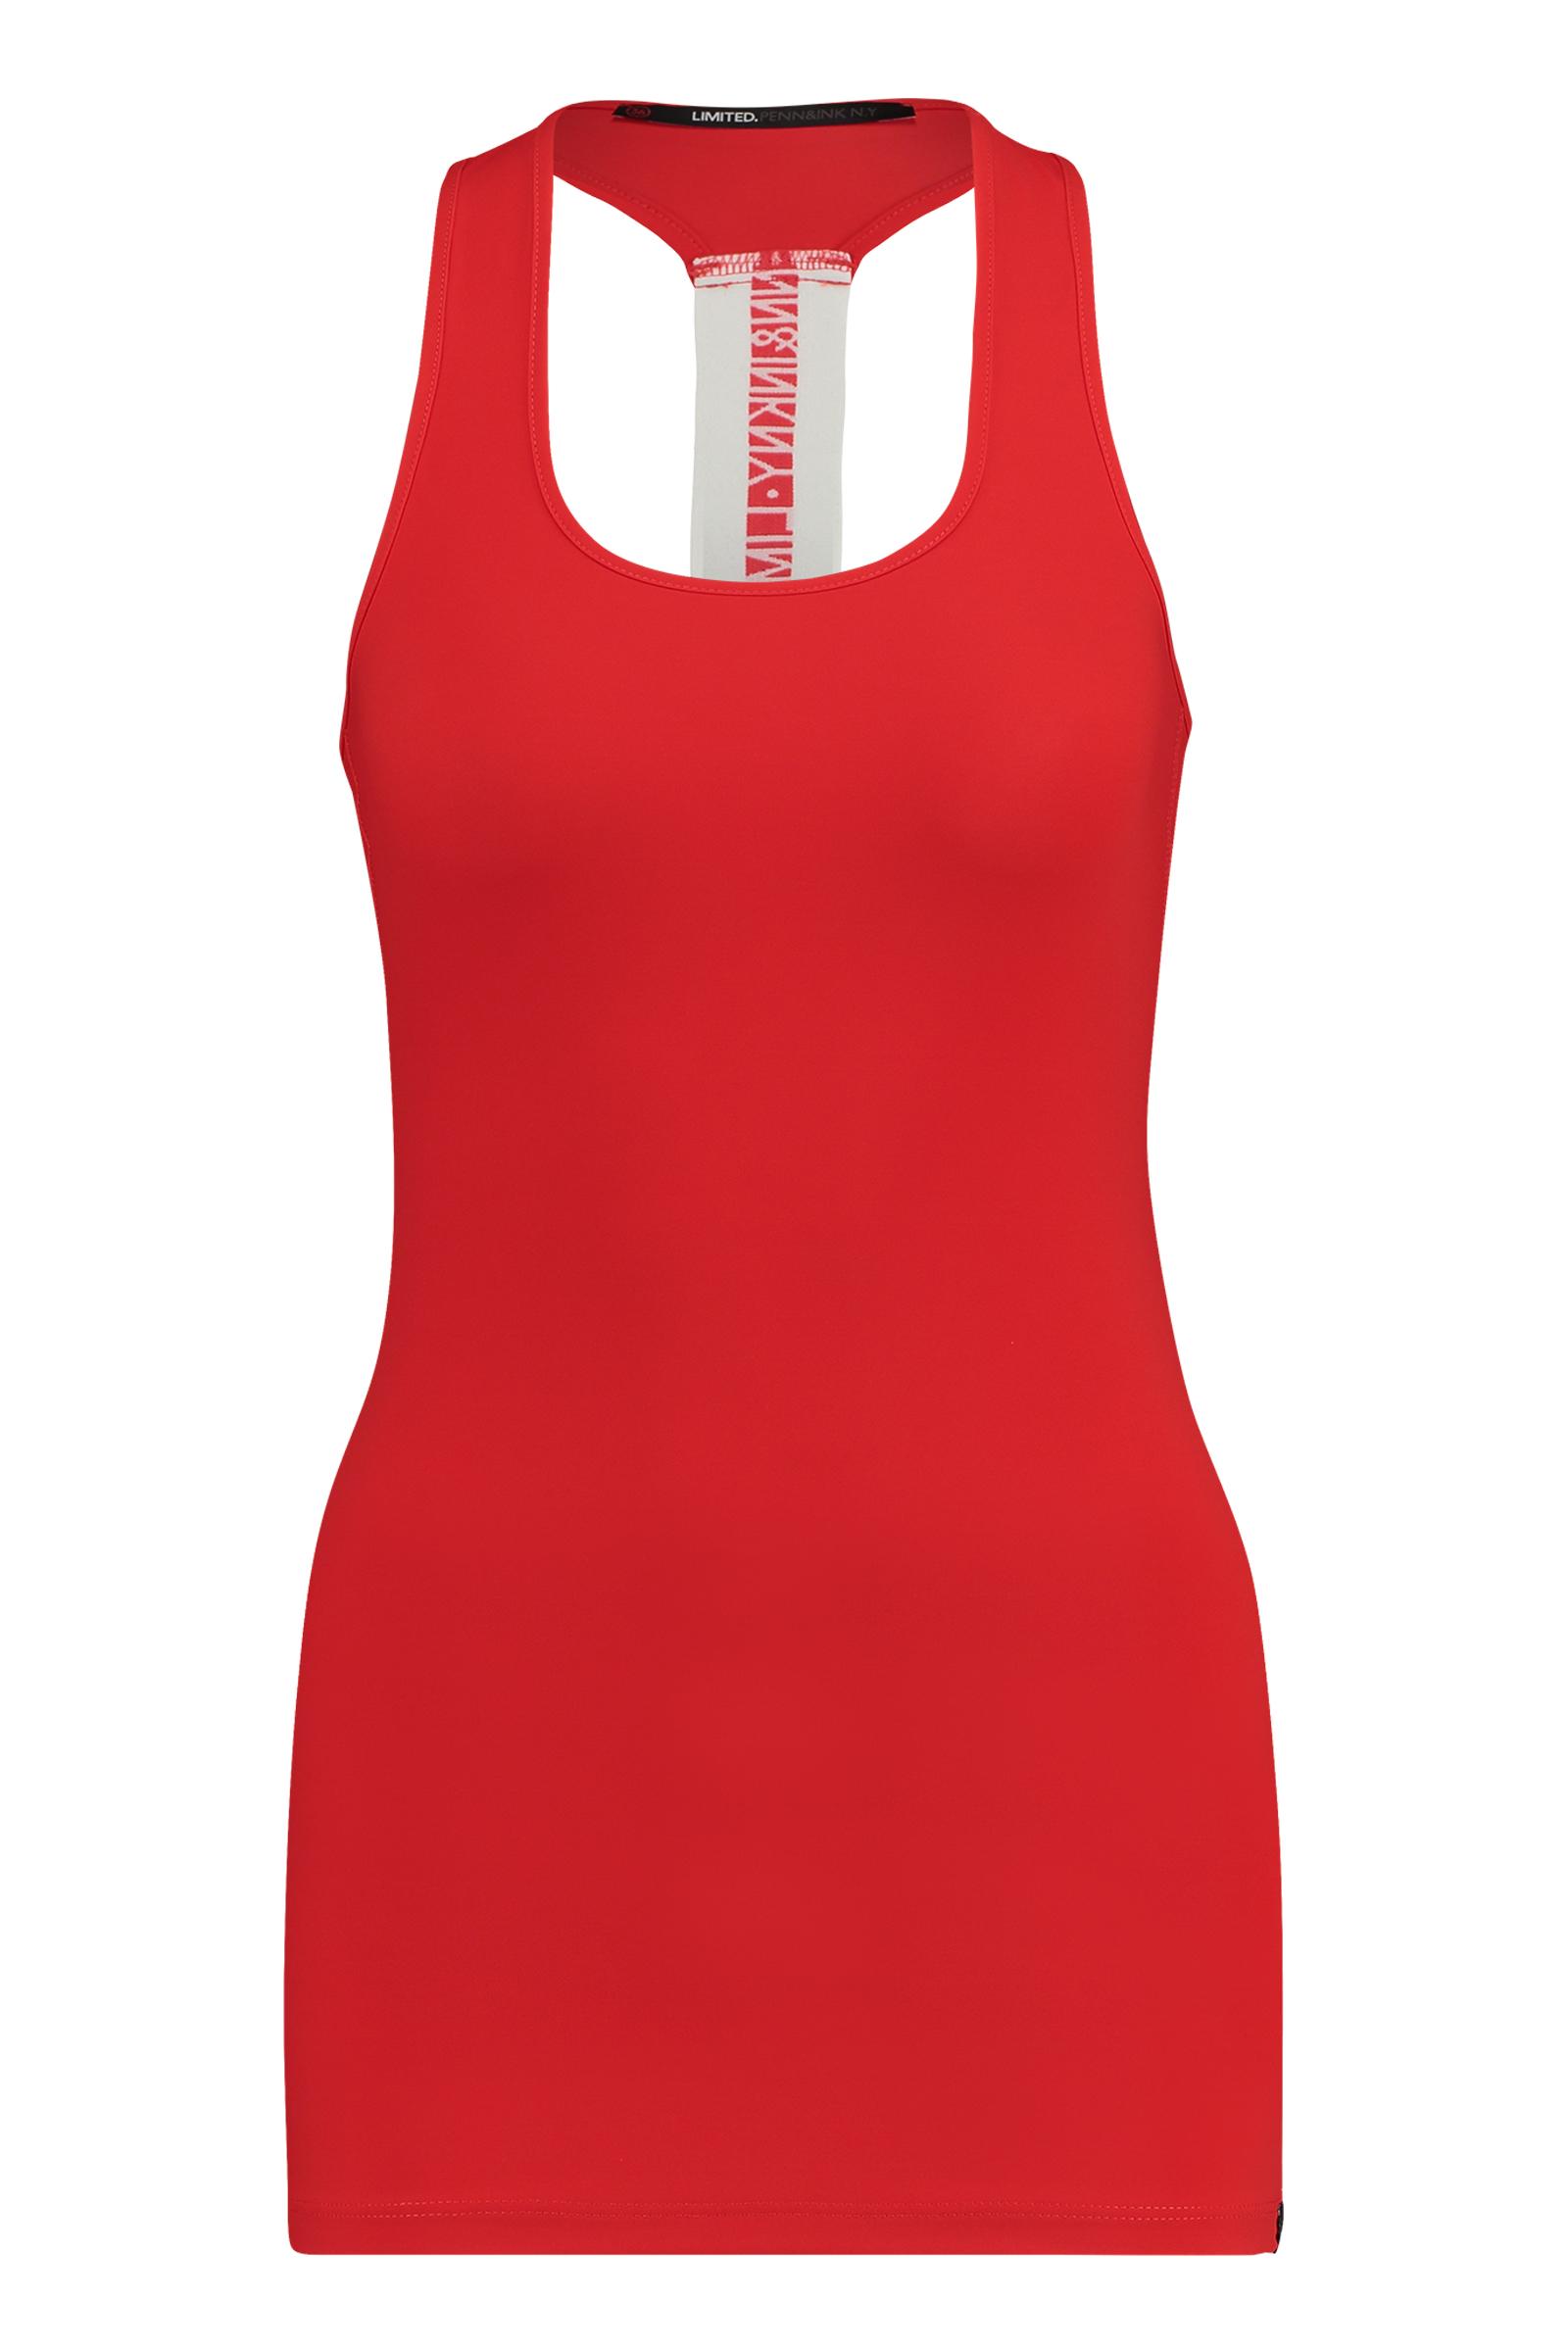 Oranje rode dames top Penn & Ink - S18N261LTD